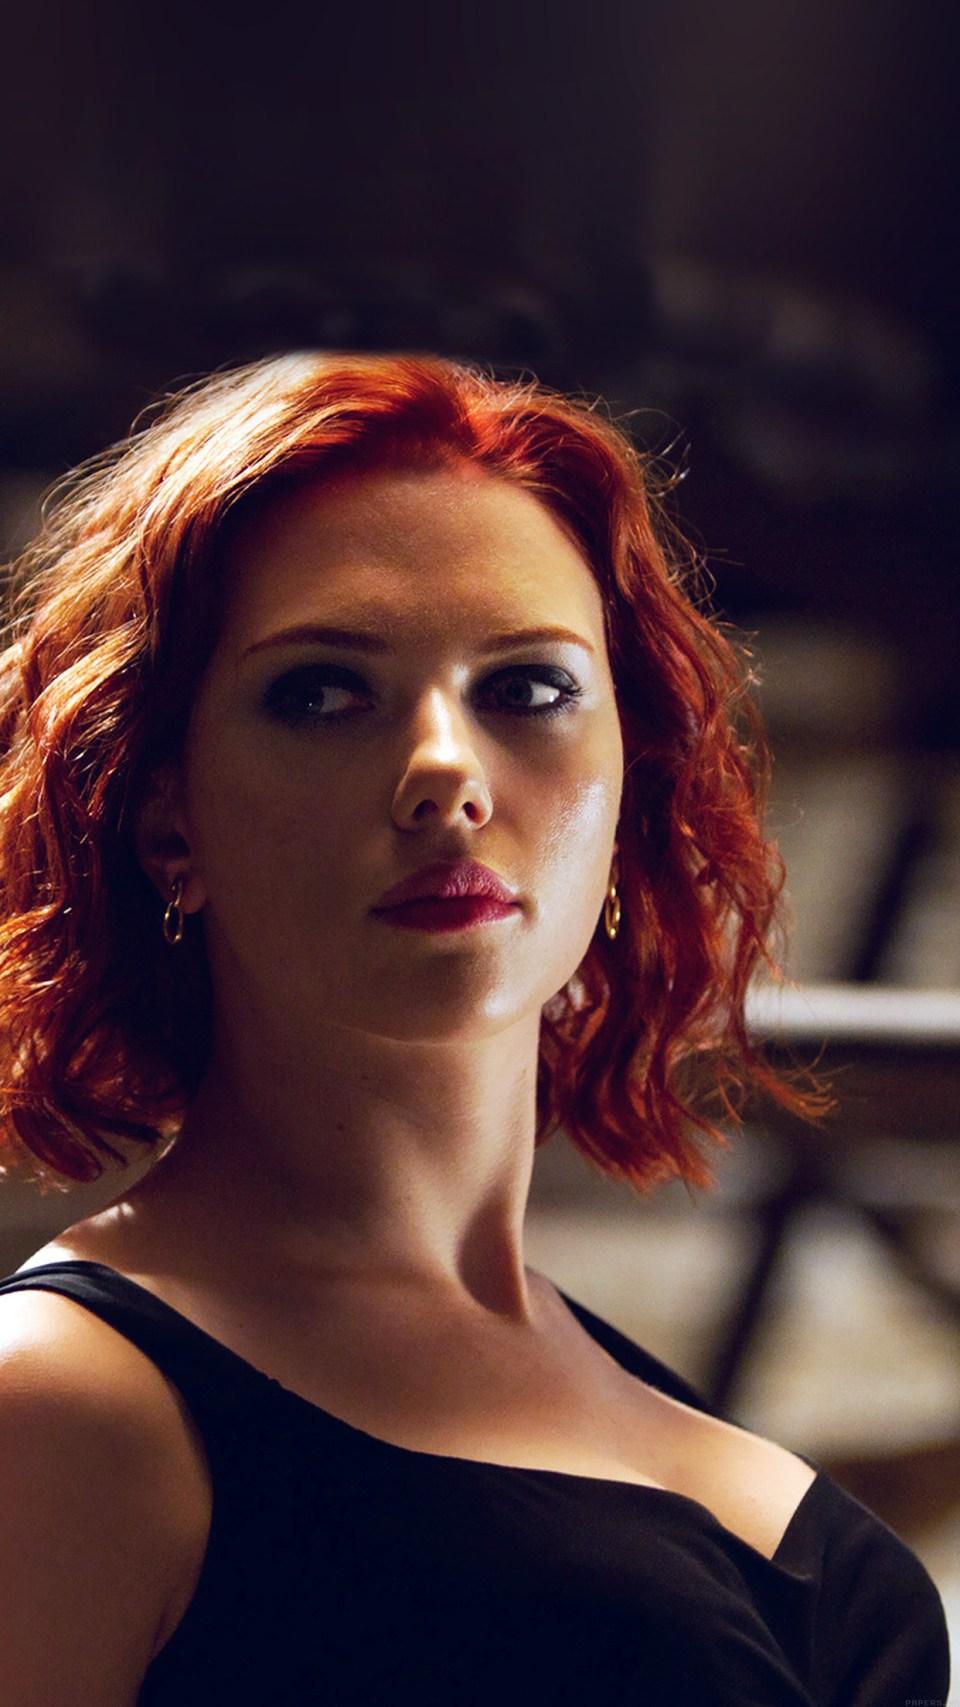 Iphone 6 Plus Iphone6papers Hf29 Avengers Natasha Scarlett Johansson Y Hero